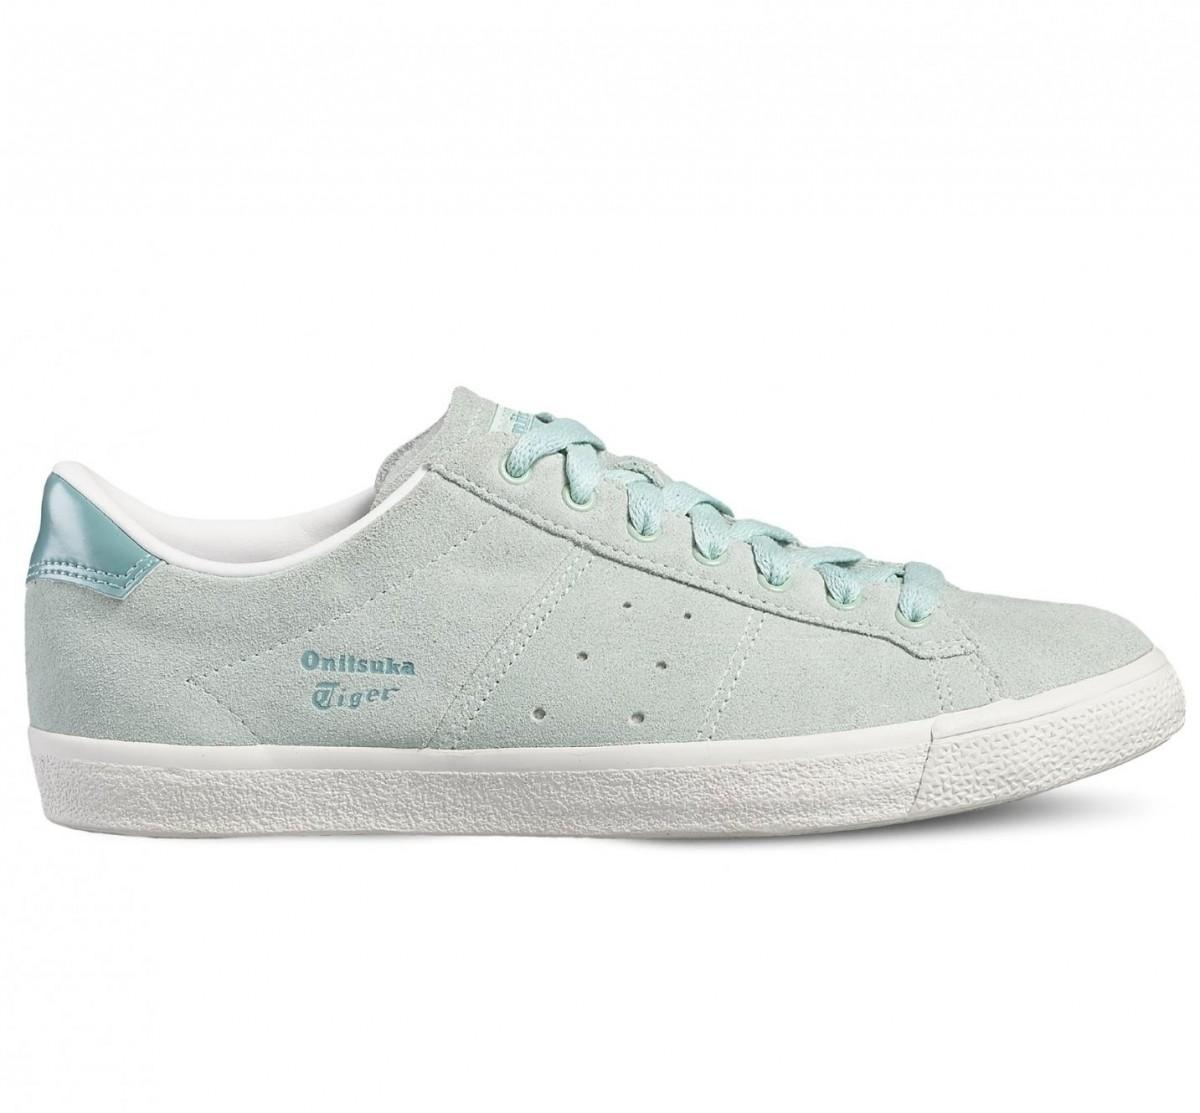 Asics Lawnship Sneaker Damen Schuhe grün